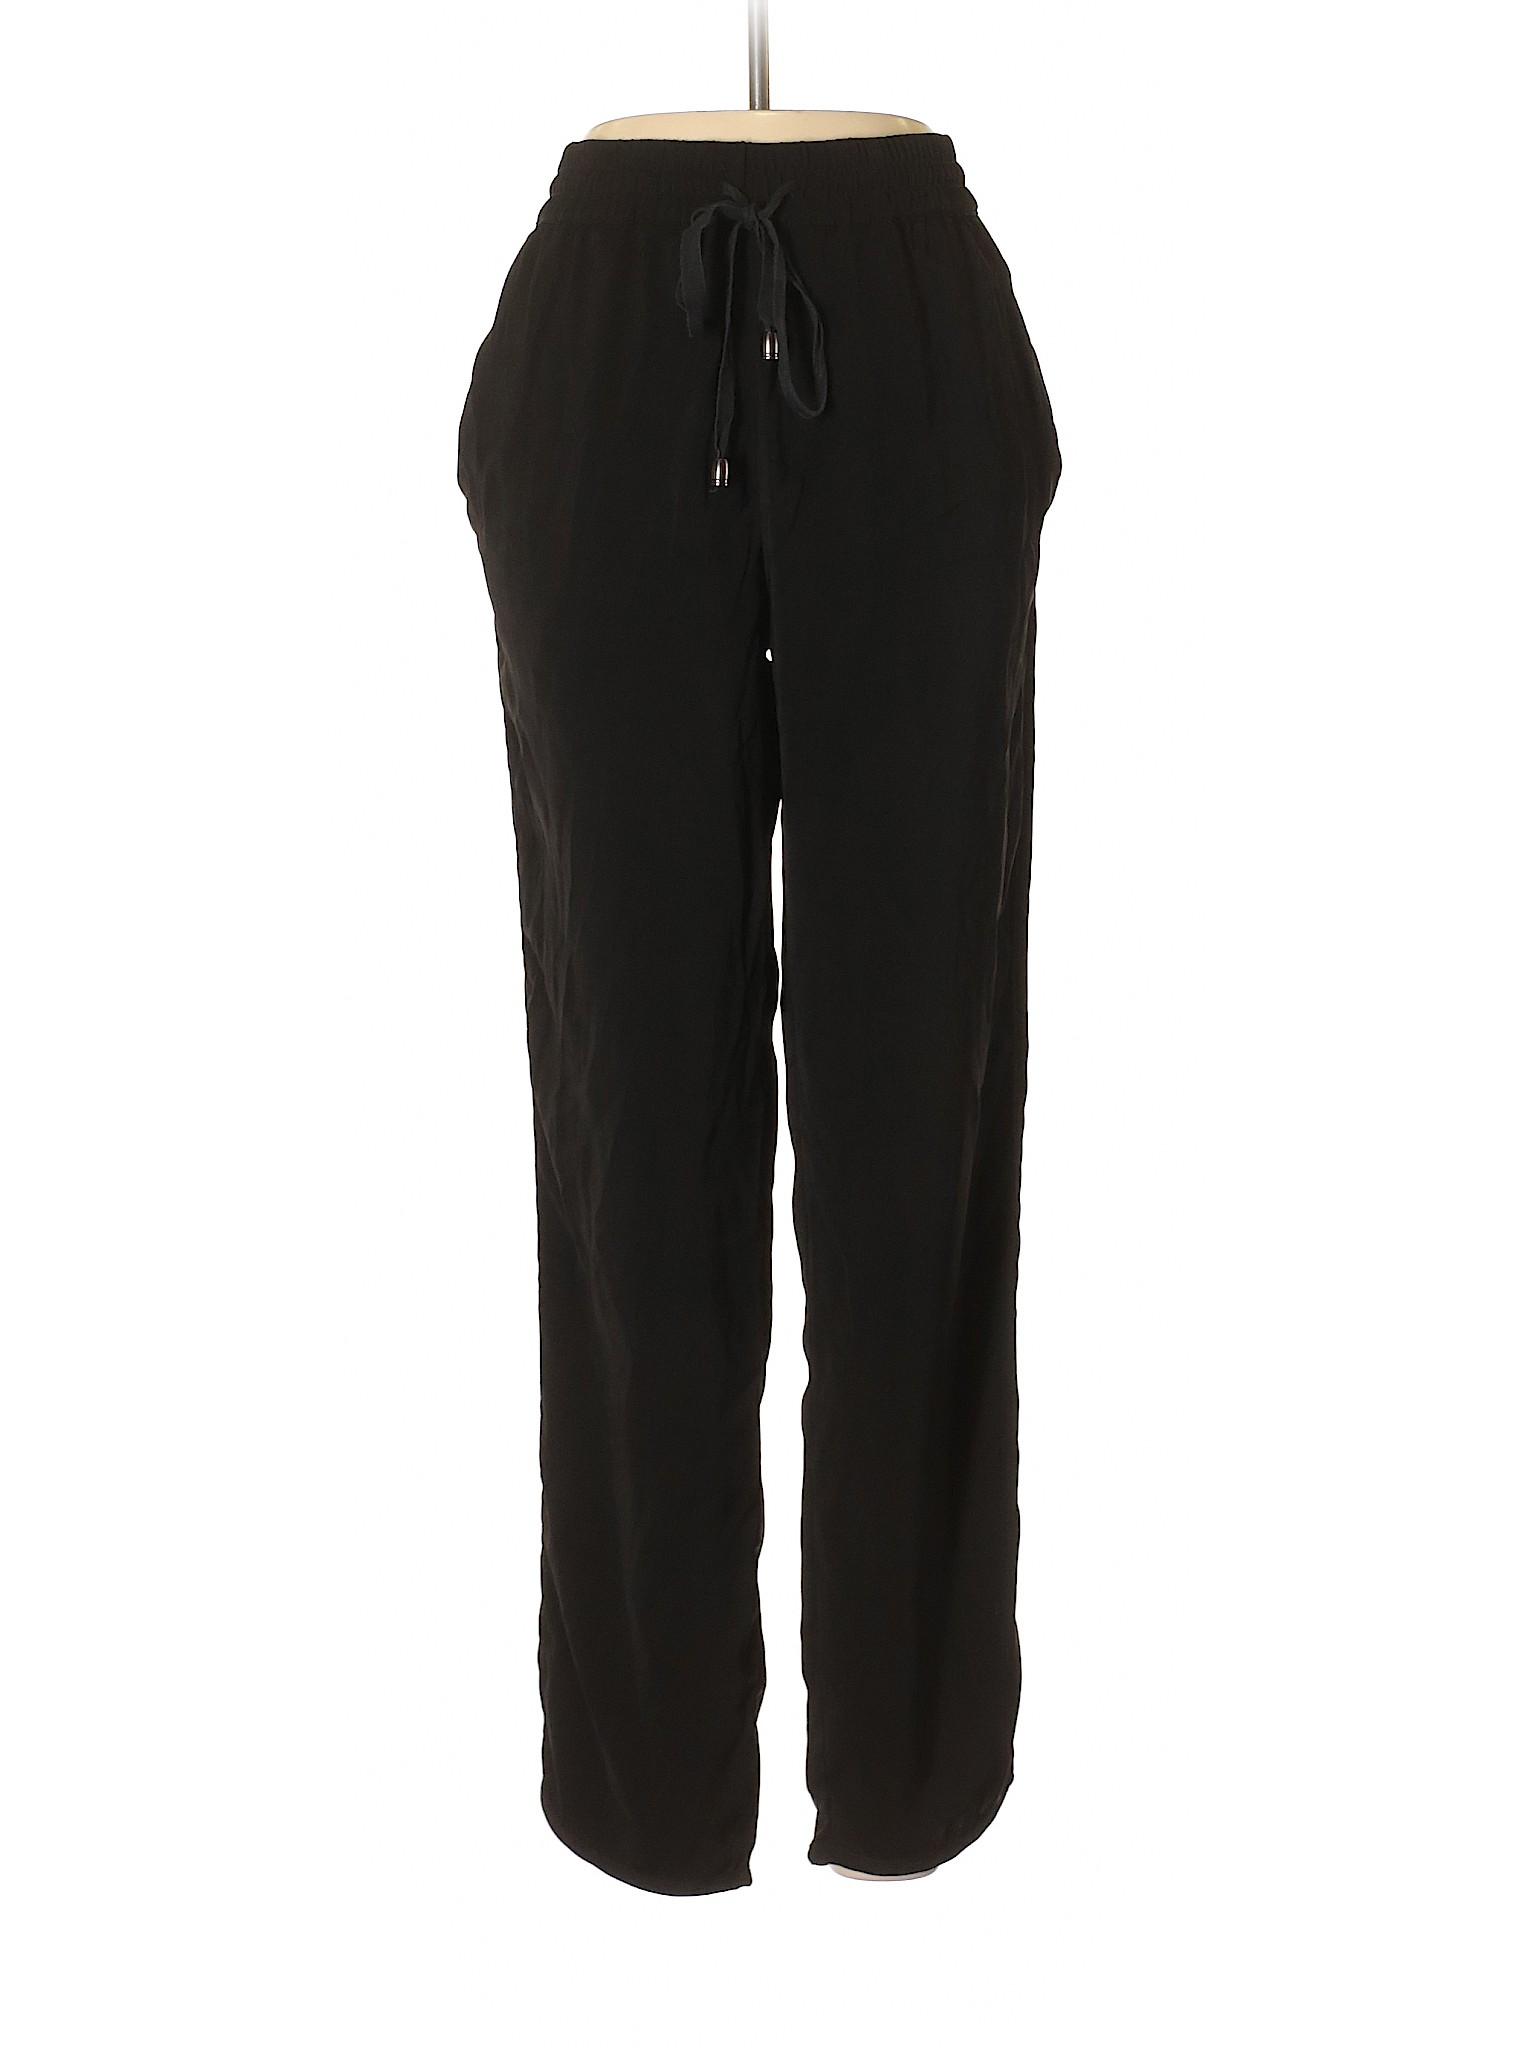 winter Gracia Casual Casual Boutique Boutique Gracia Pants winter R4qBp